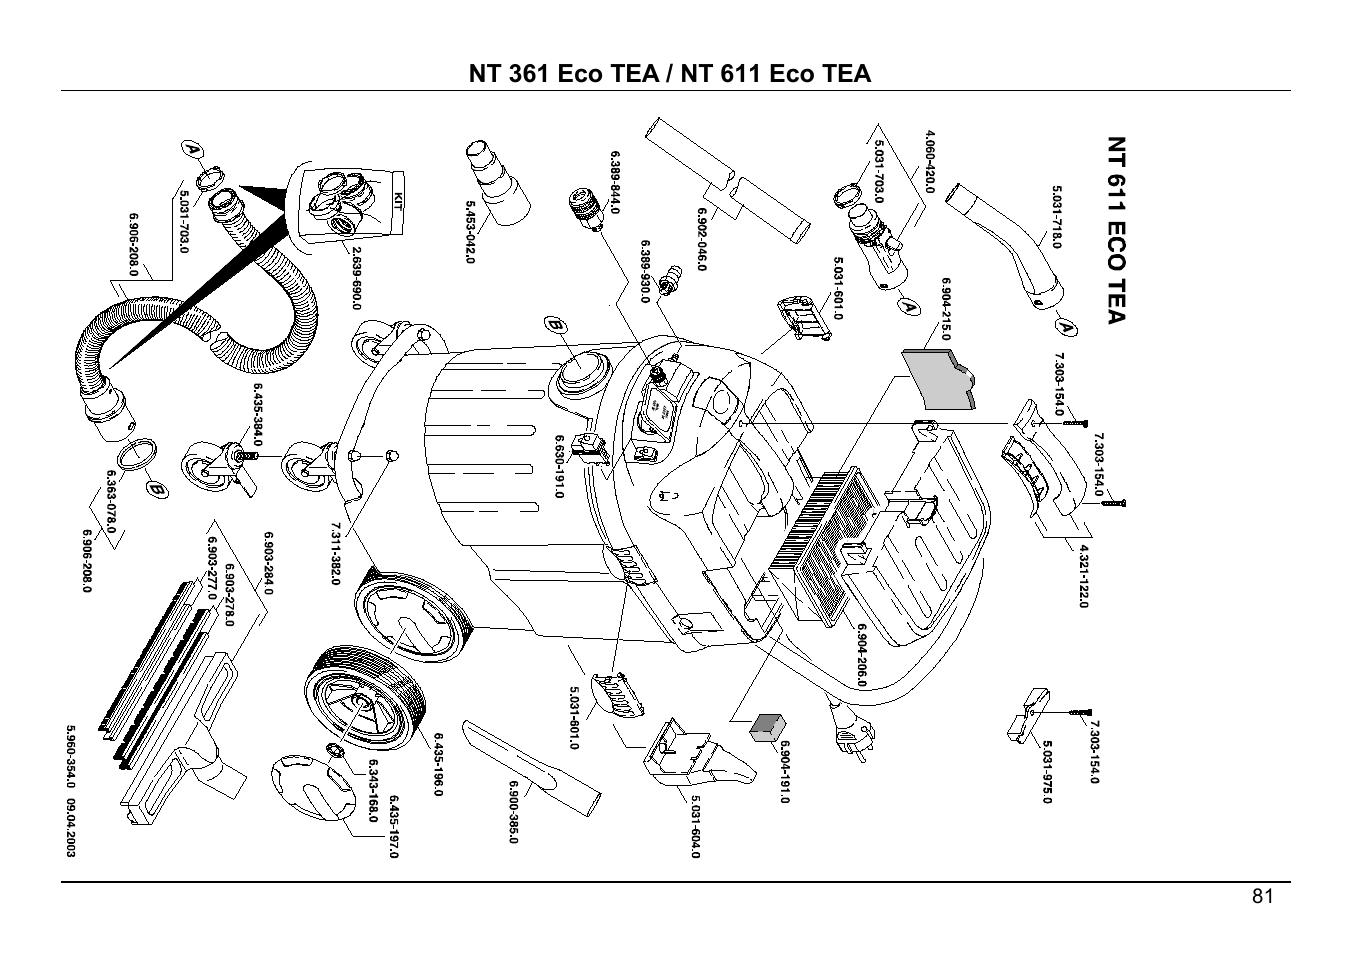 karcher eco tea nt 361 user manual